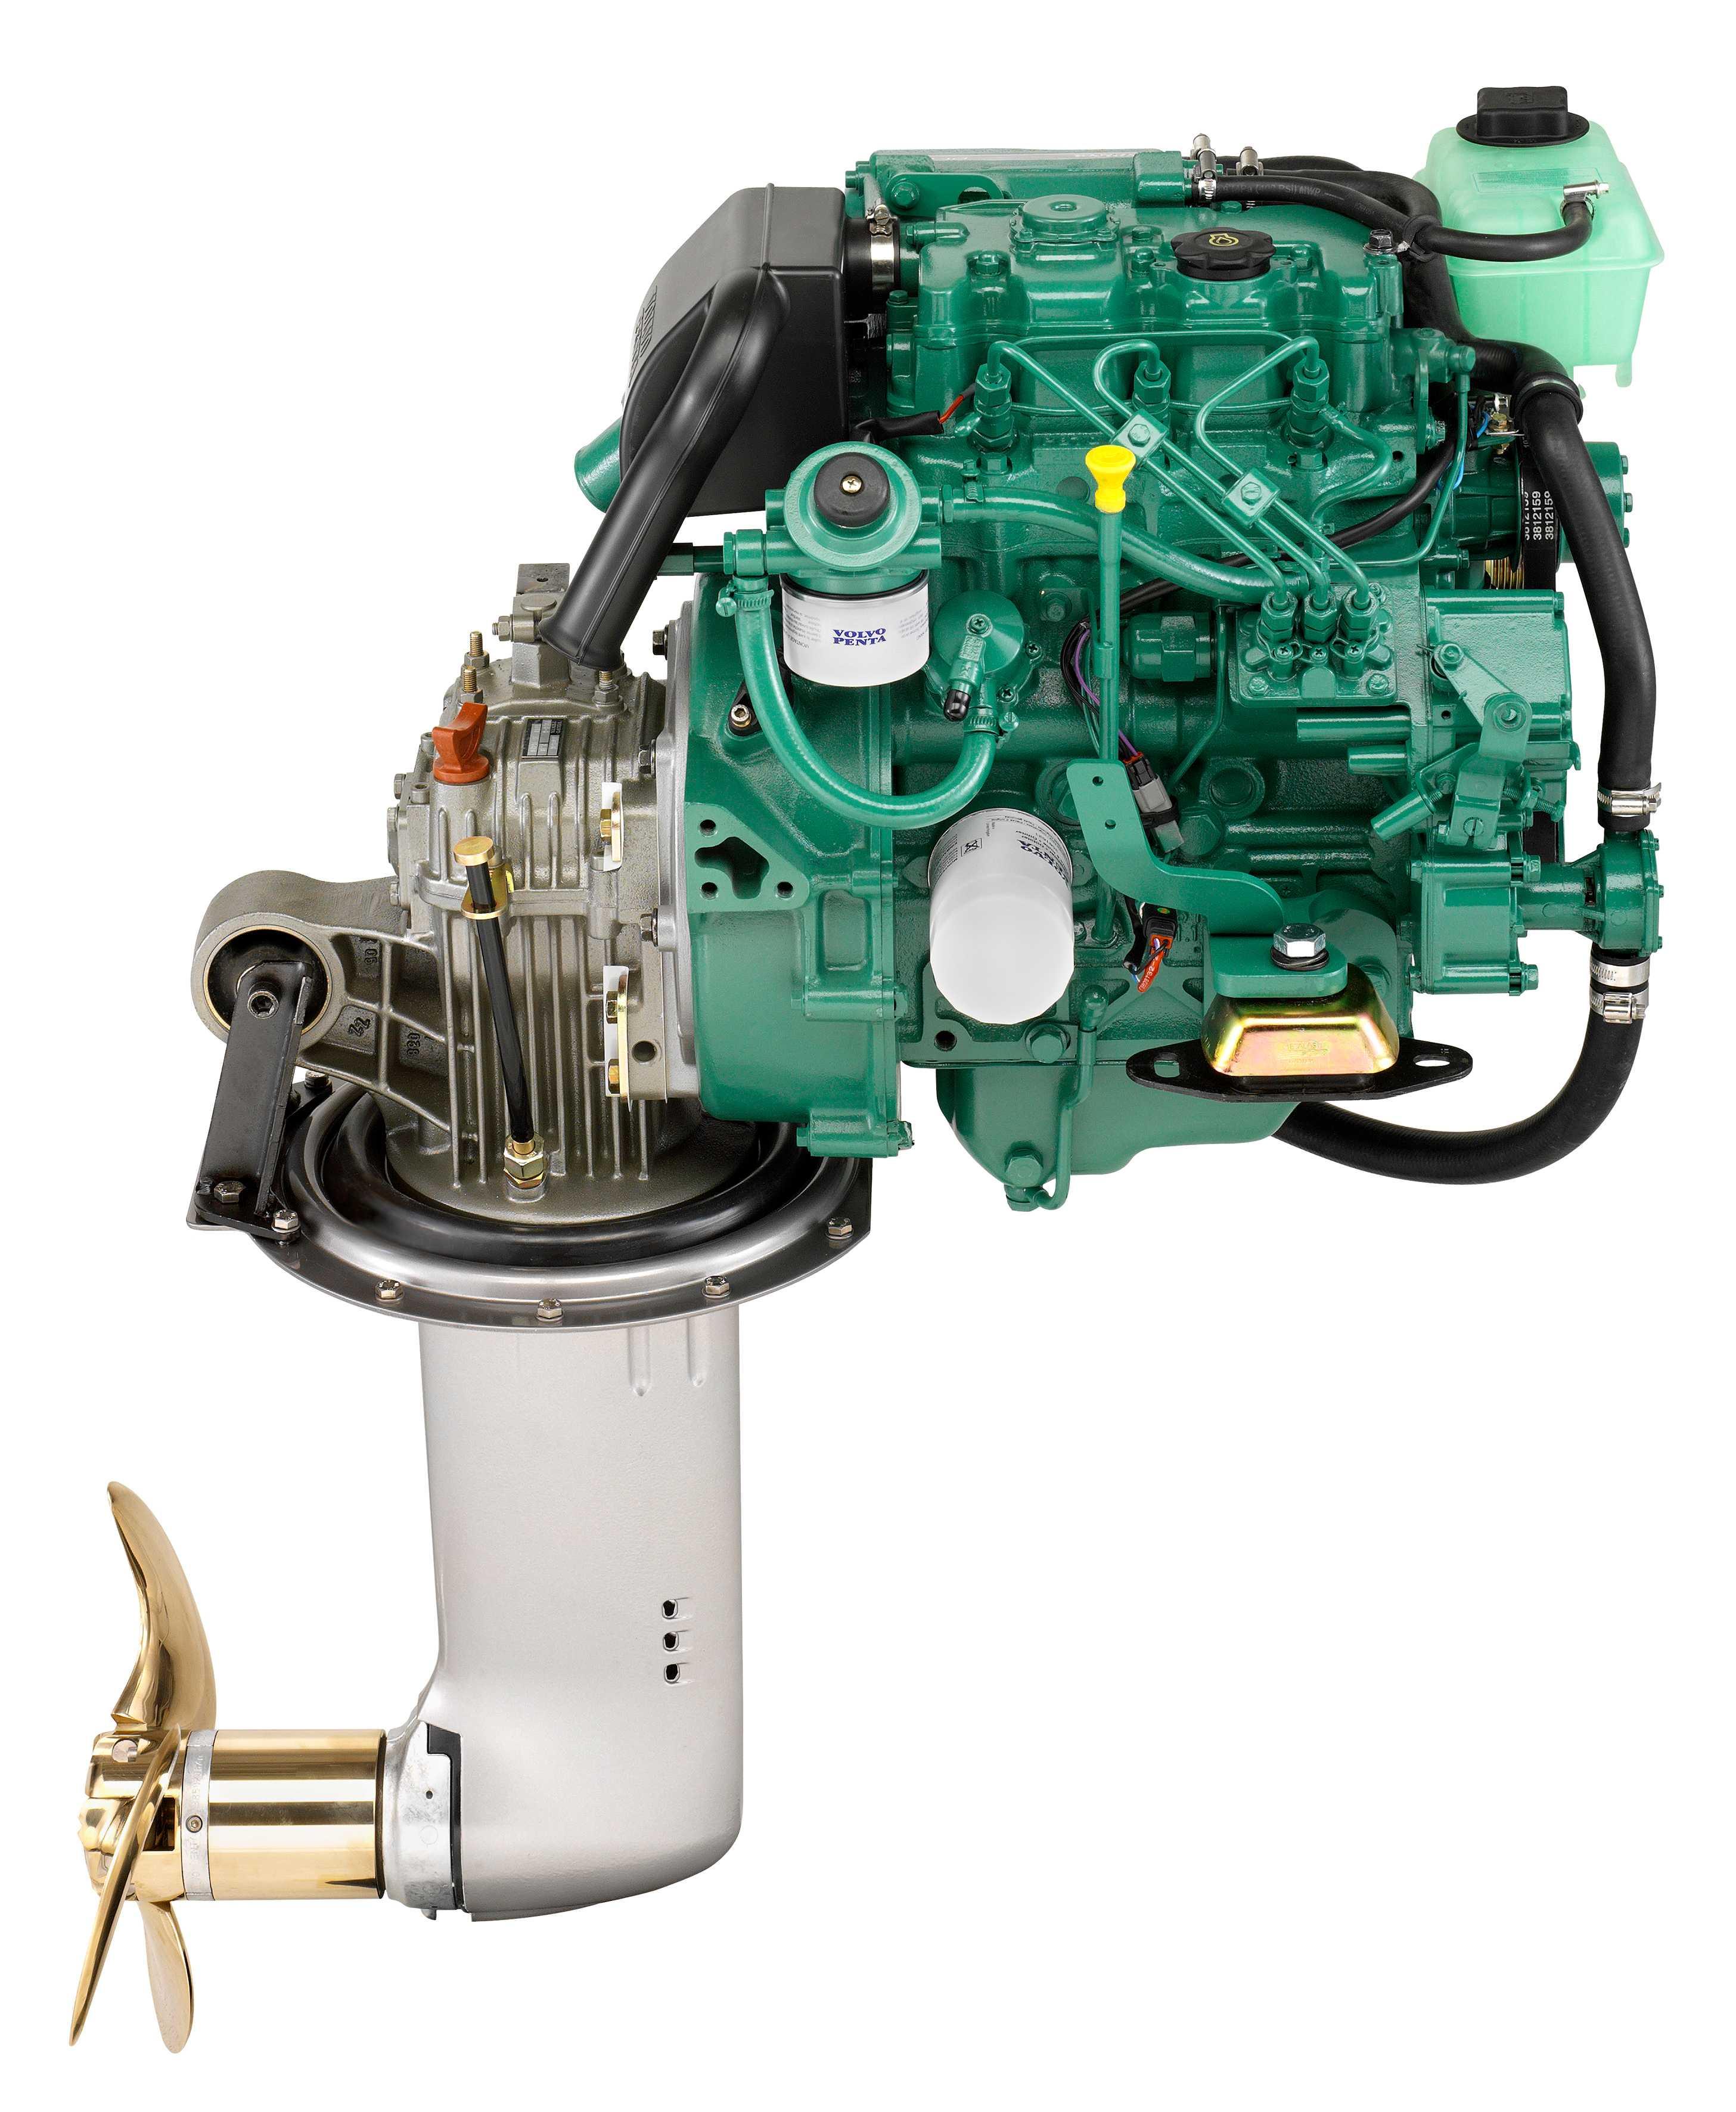 Dealerships & Product Volvo Penta Sailboat D1-30